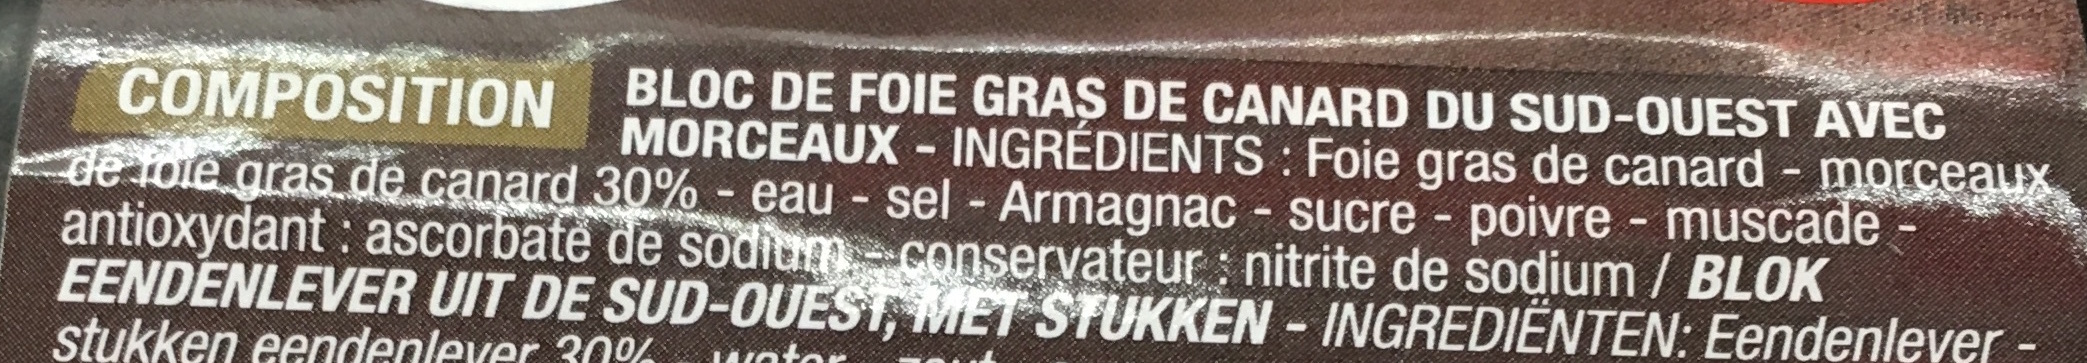 Bloc de Foie gras de canard du Sud-Ouest - Ingrediënten - fr